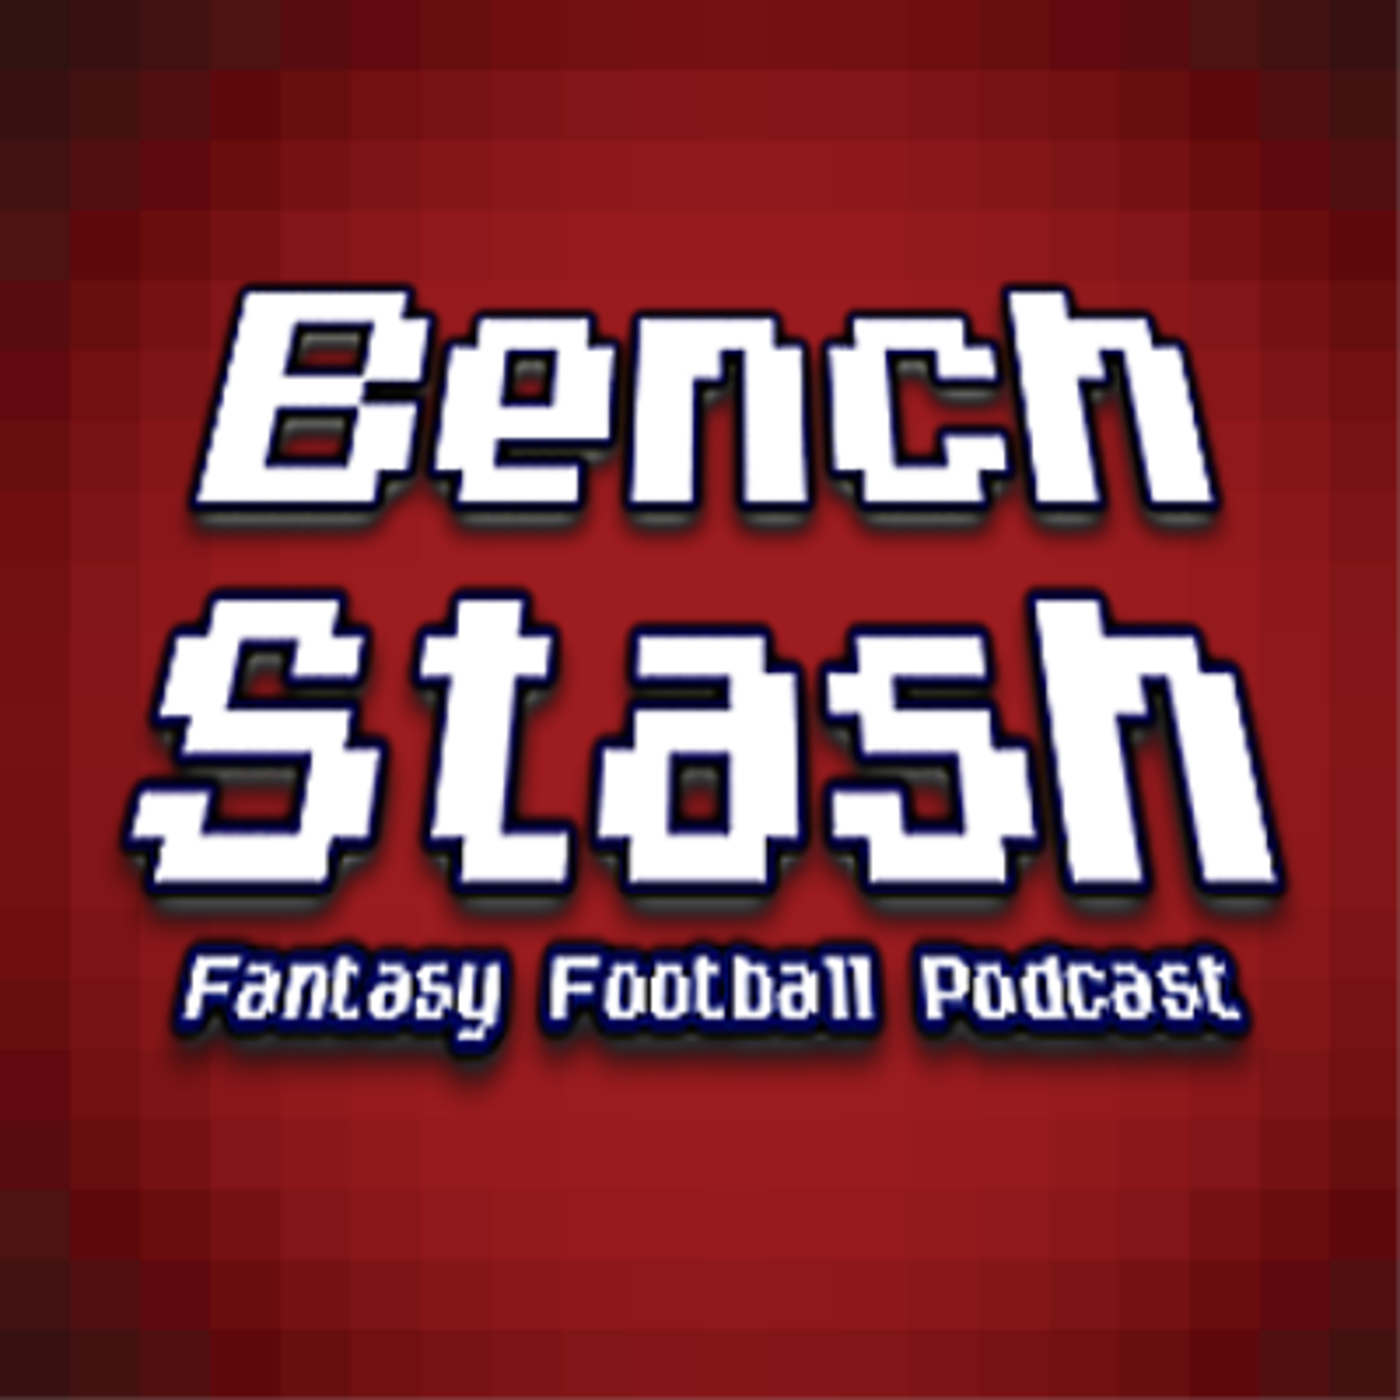 Bench Stash Fantasy Football Podcast